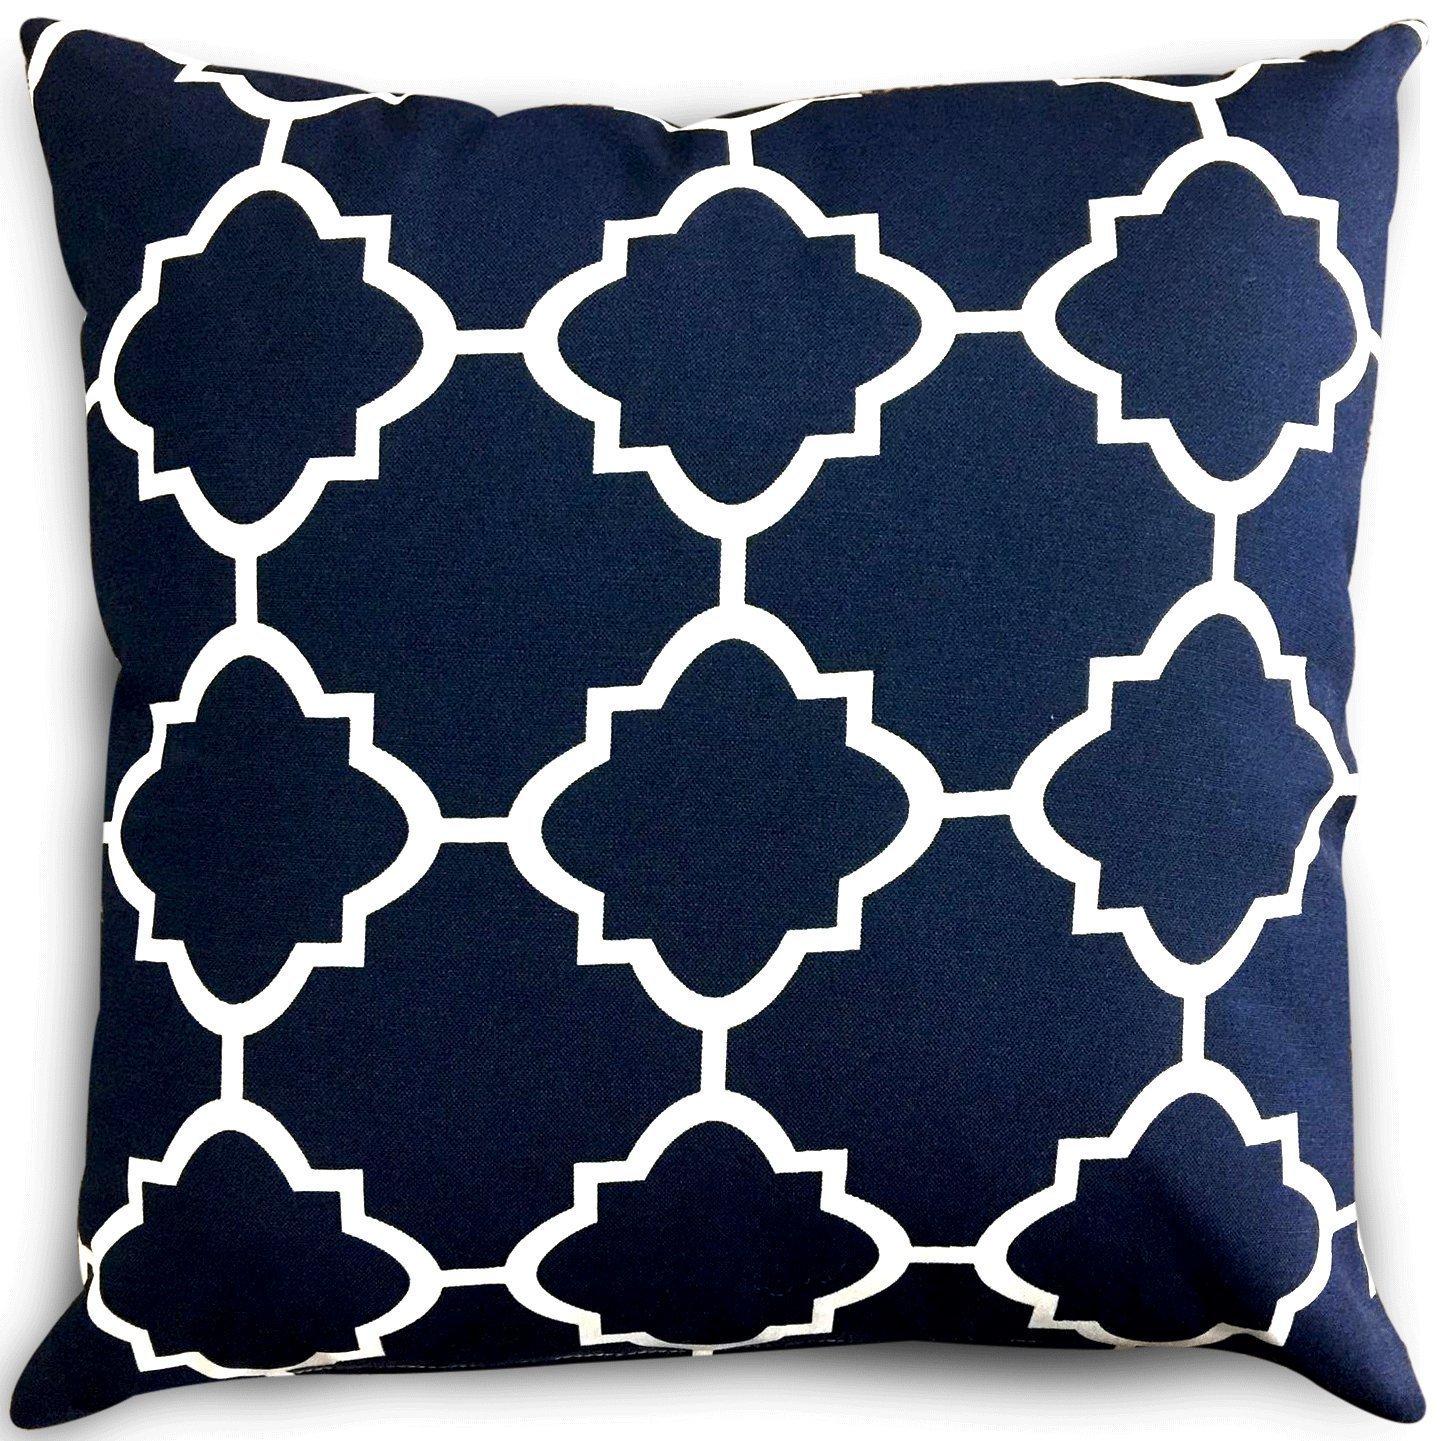 Utopia Bedding Decorative Square 18 x 18 inch Throw Pillow - Navy & White Moroccan Quatrefoil Lattice Cushion Pillow by Utopia Bedding